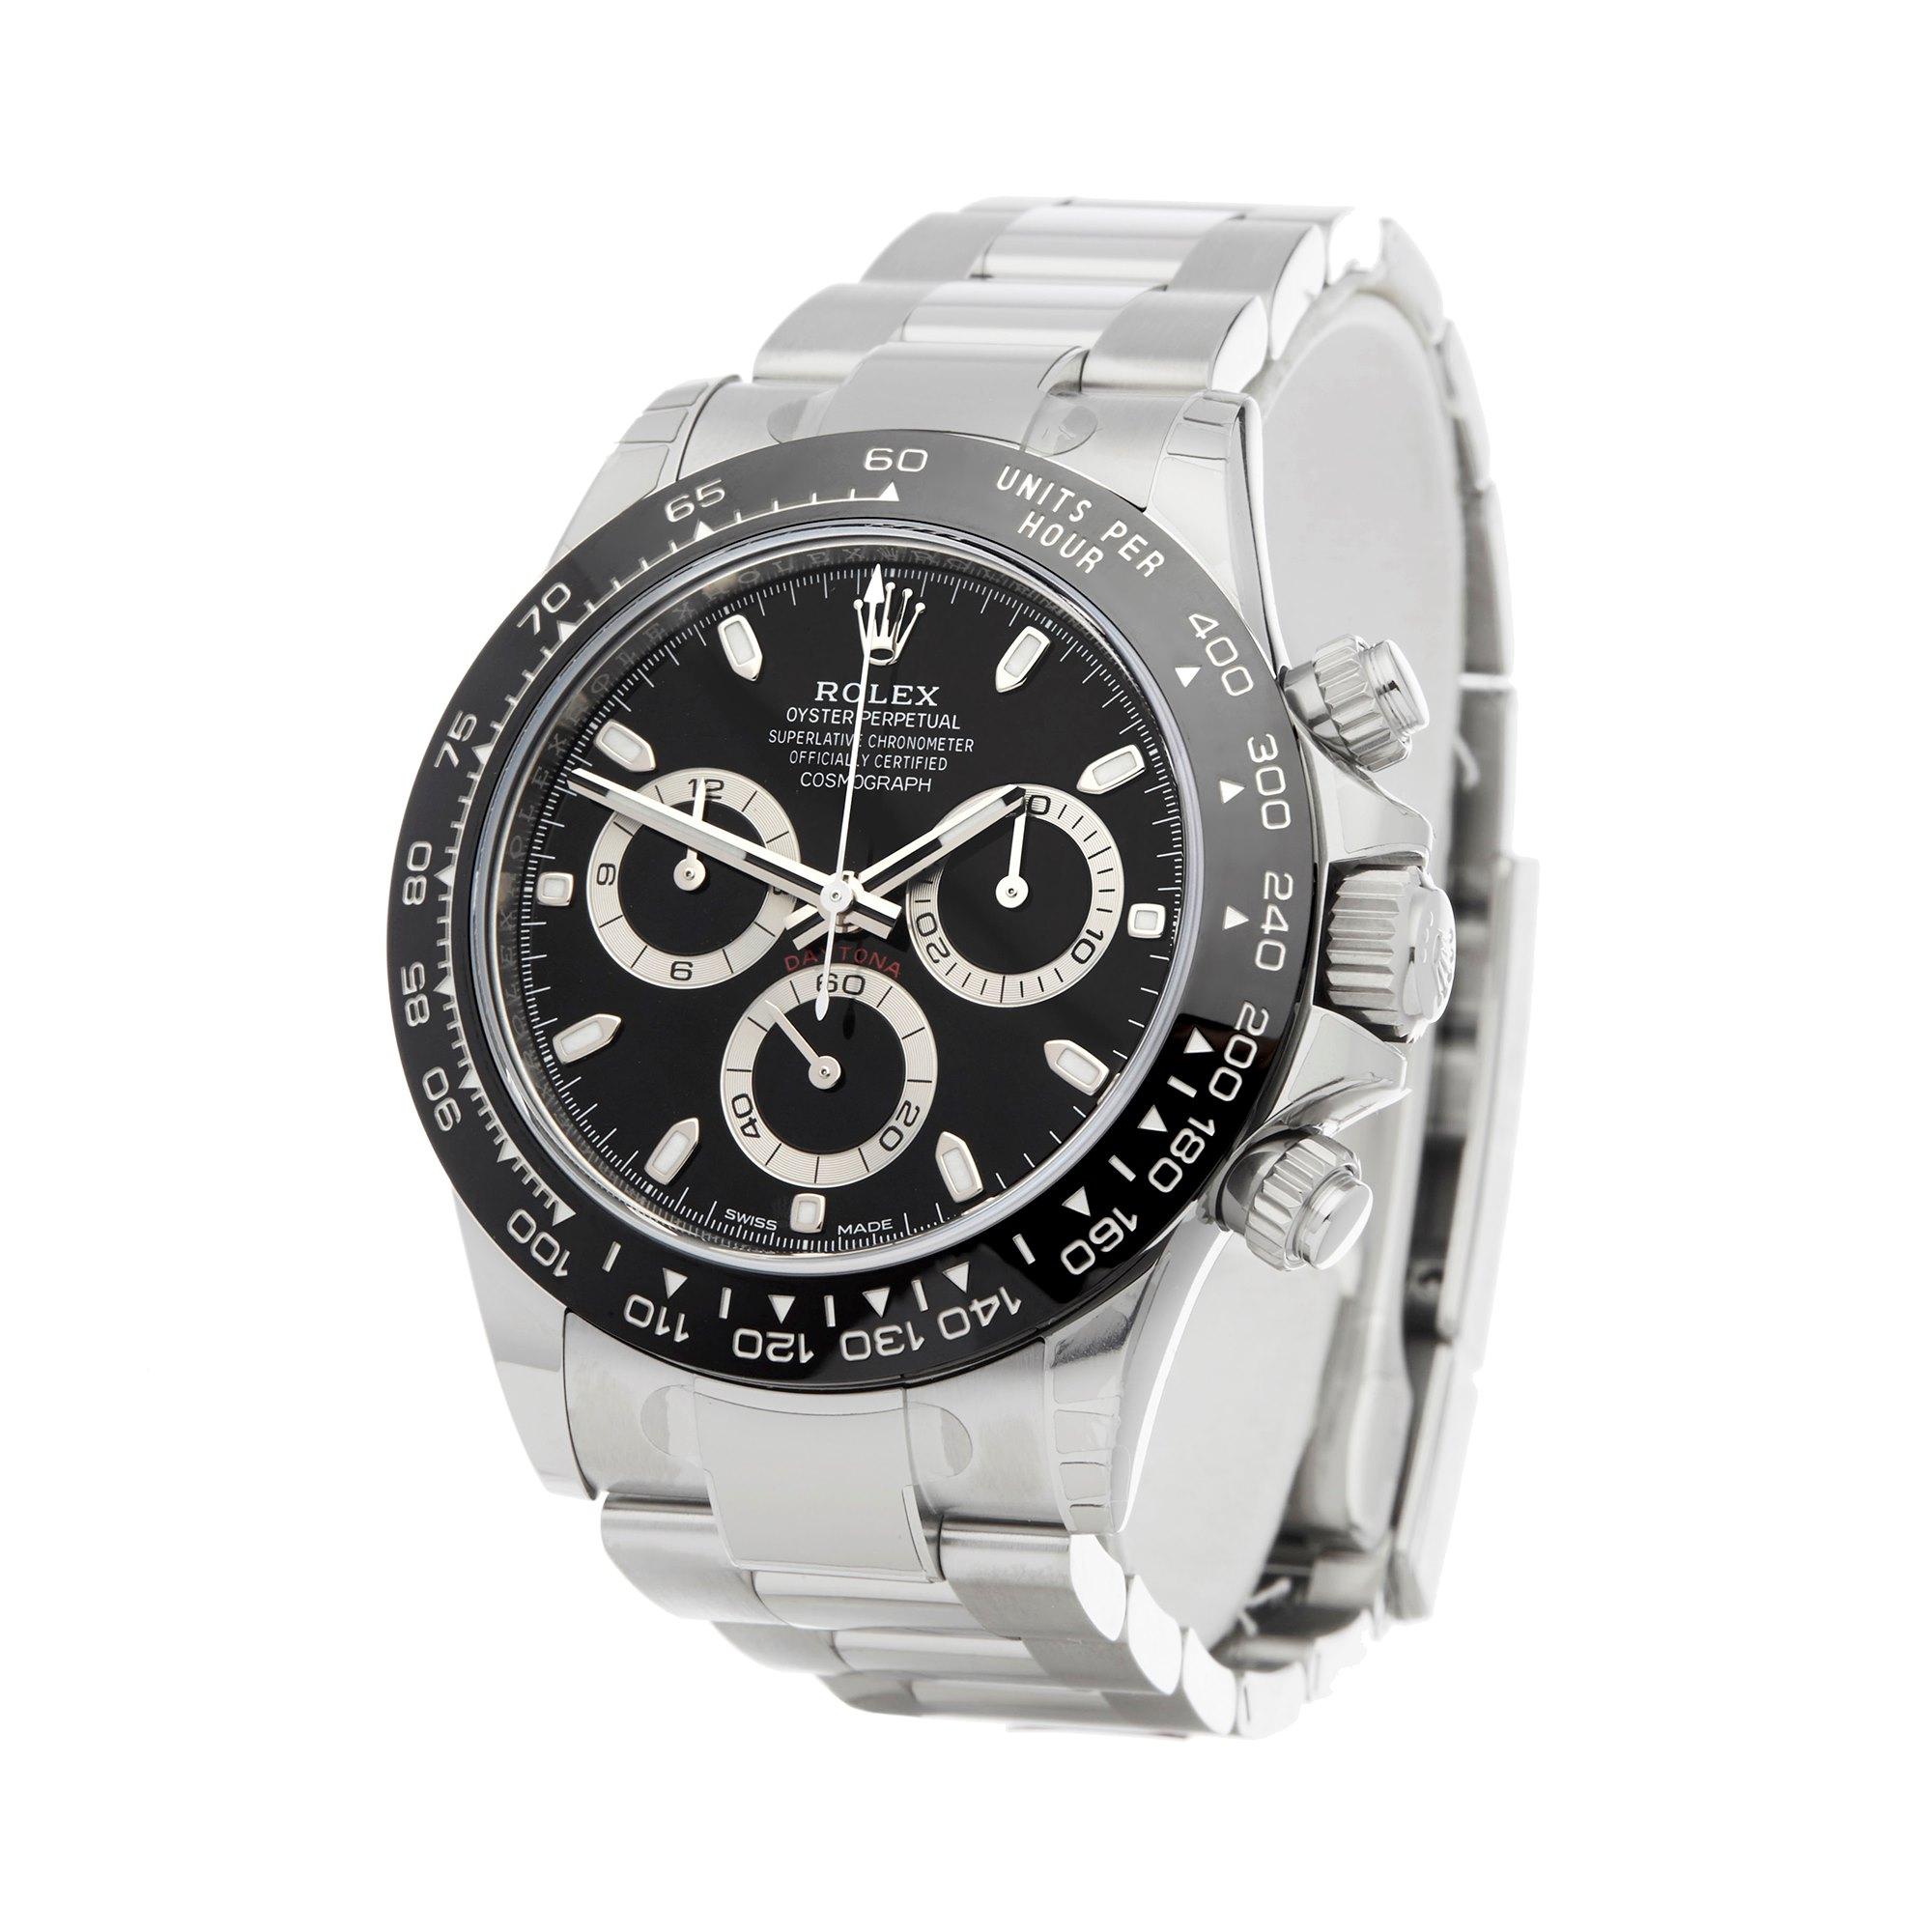 Rolex Daytona Chronograph NOS Stainless Steel 116500LN